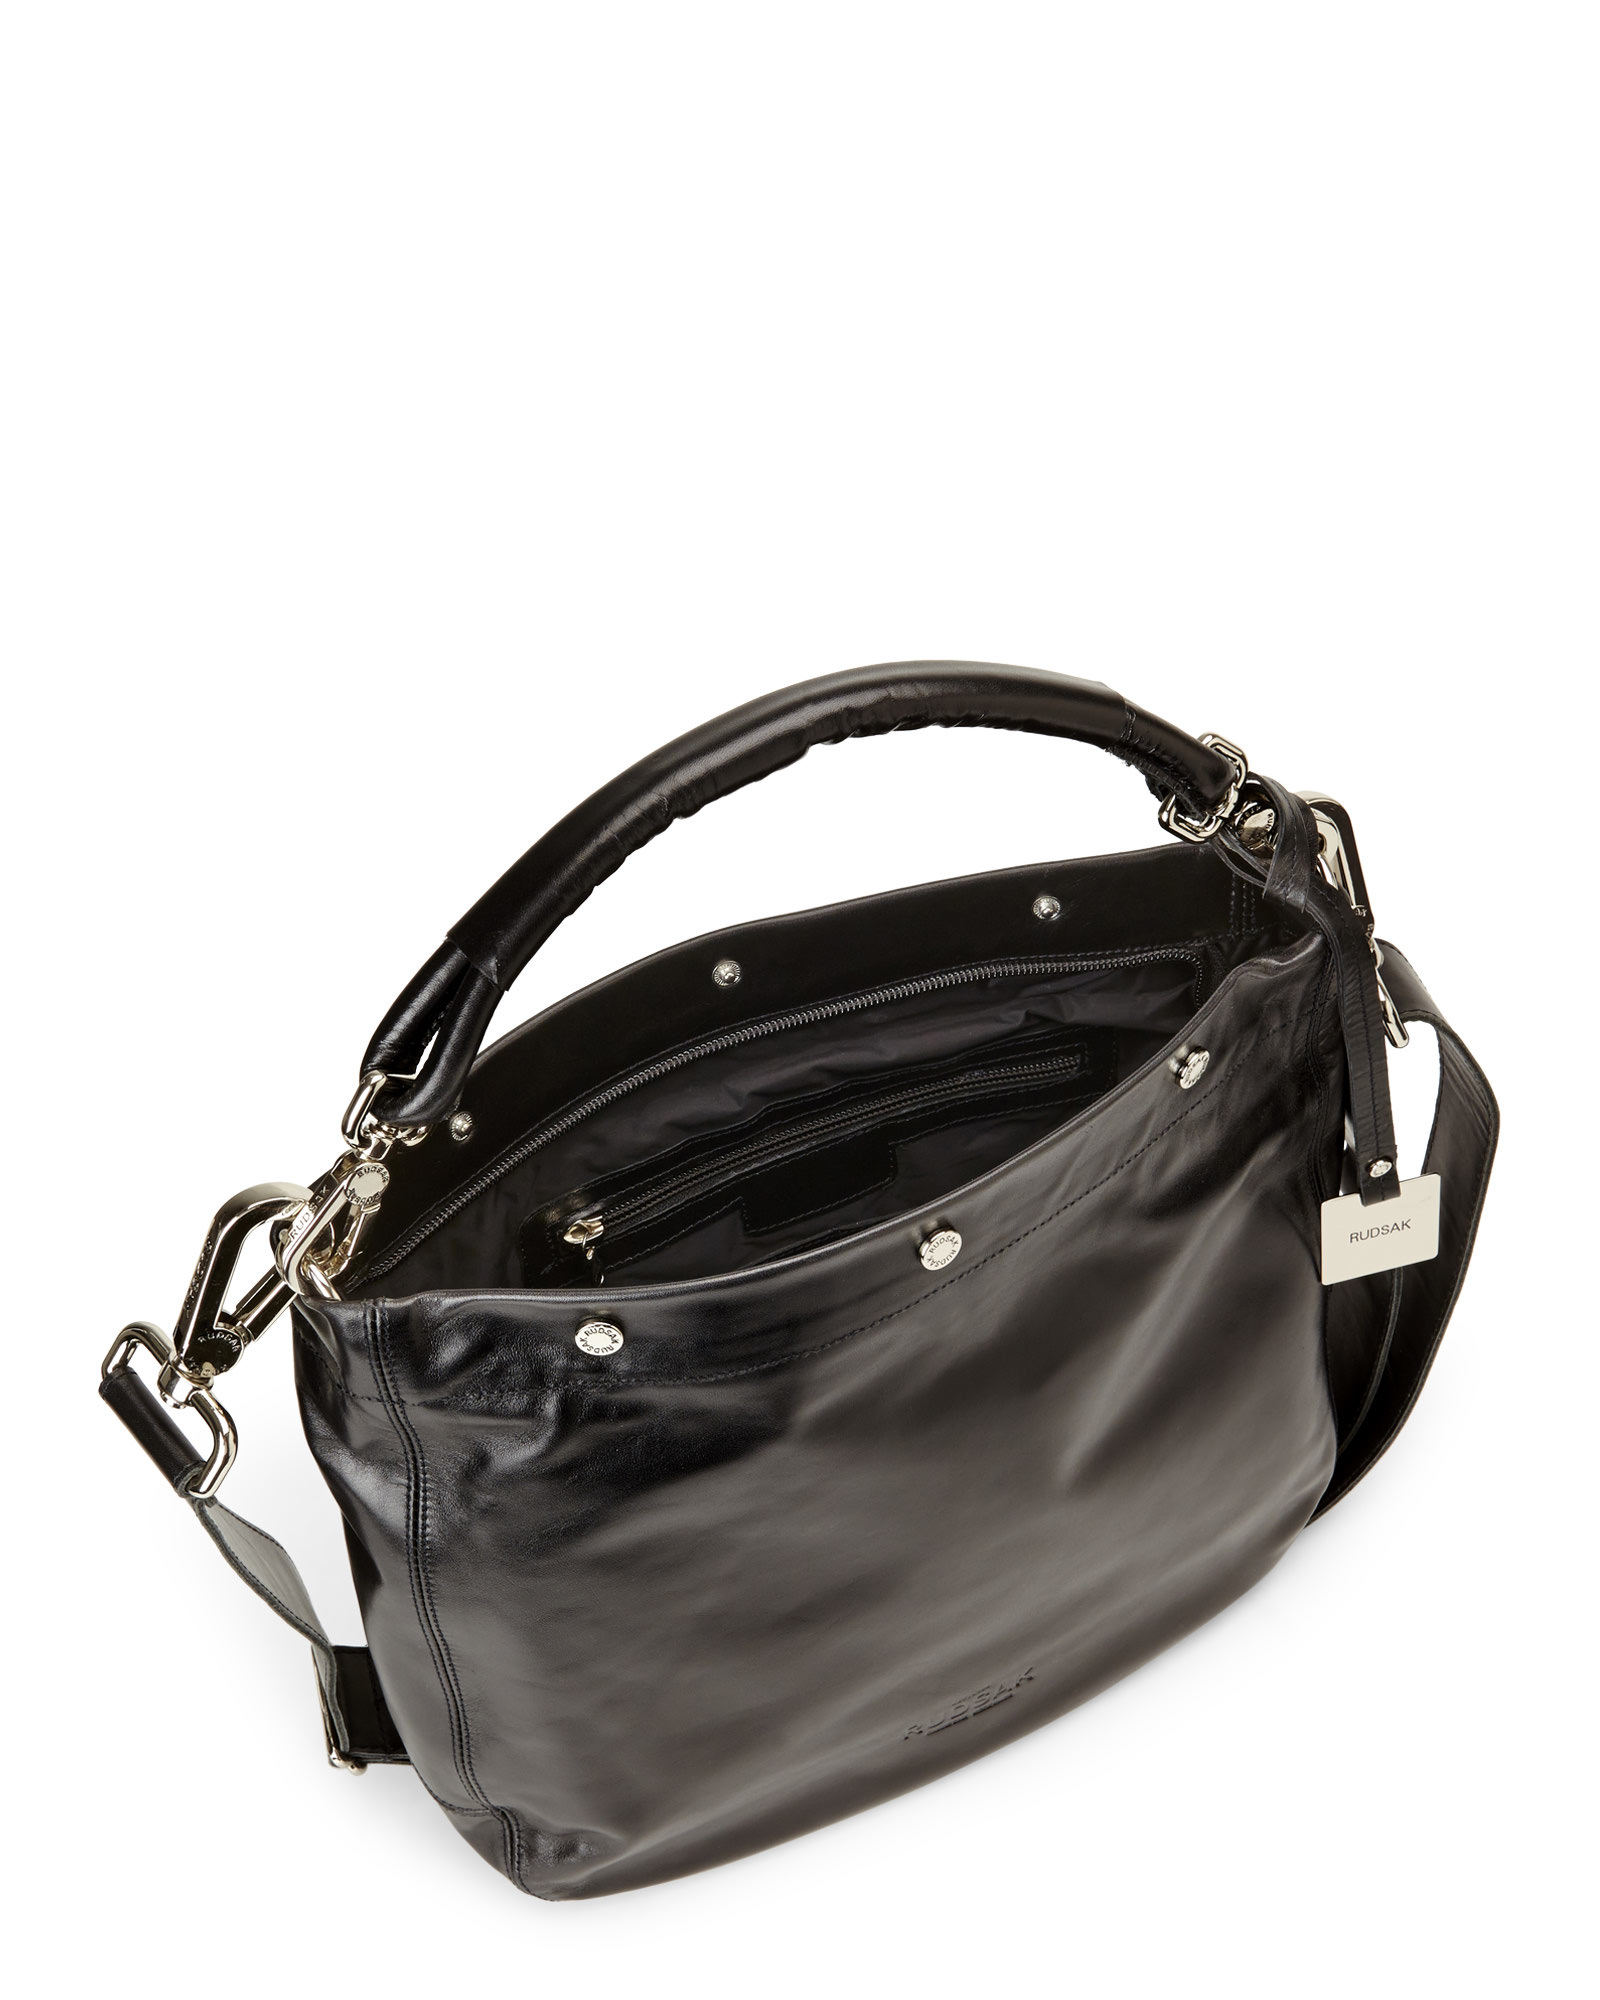 Leather Black Damar Convertible Hobo